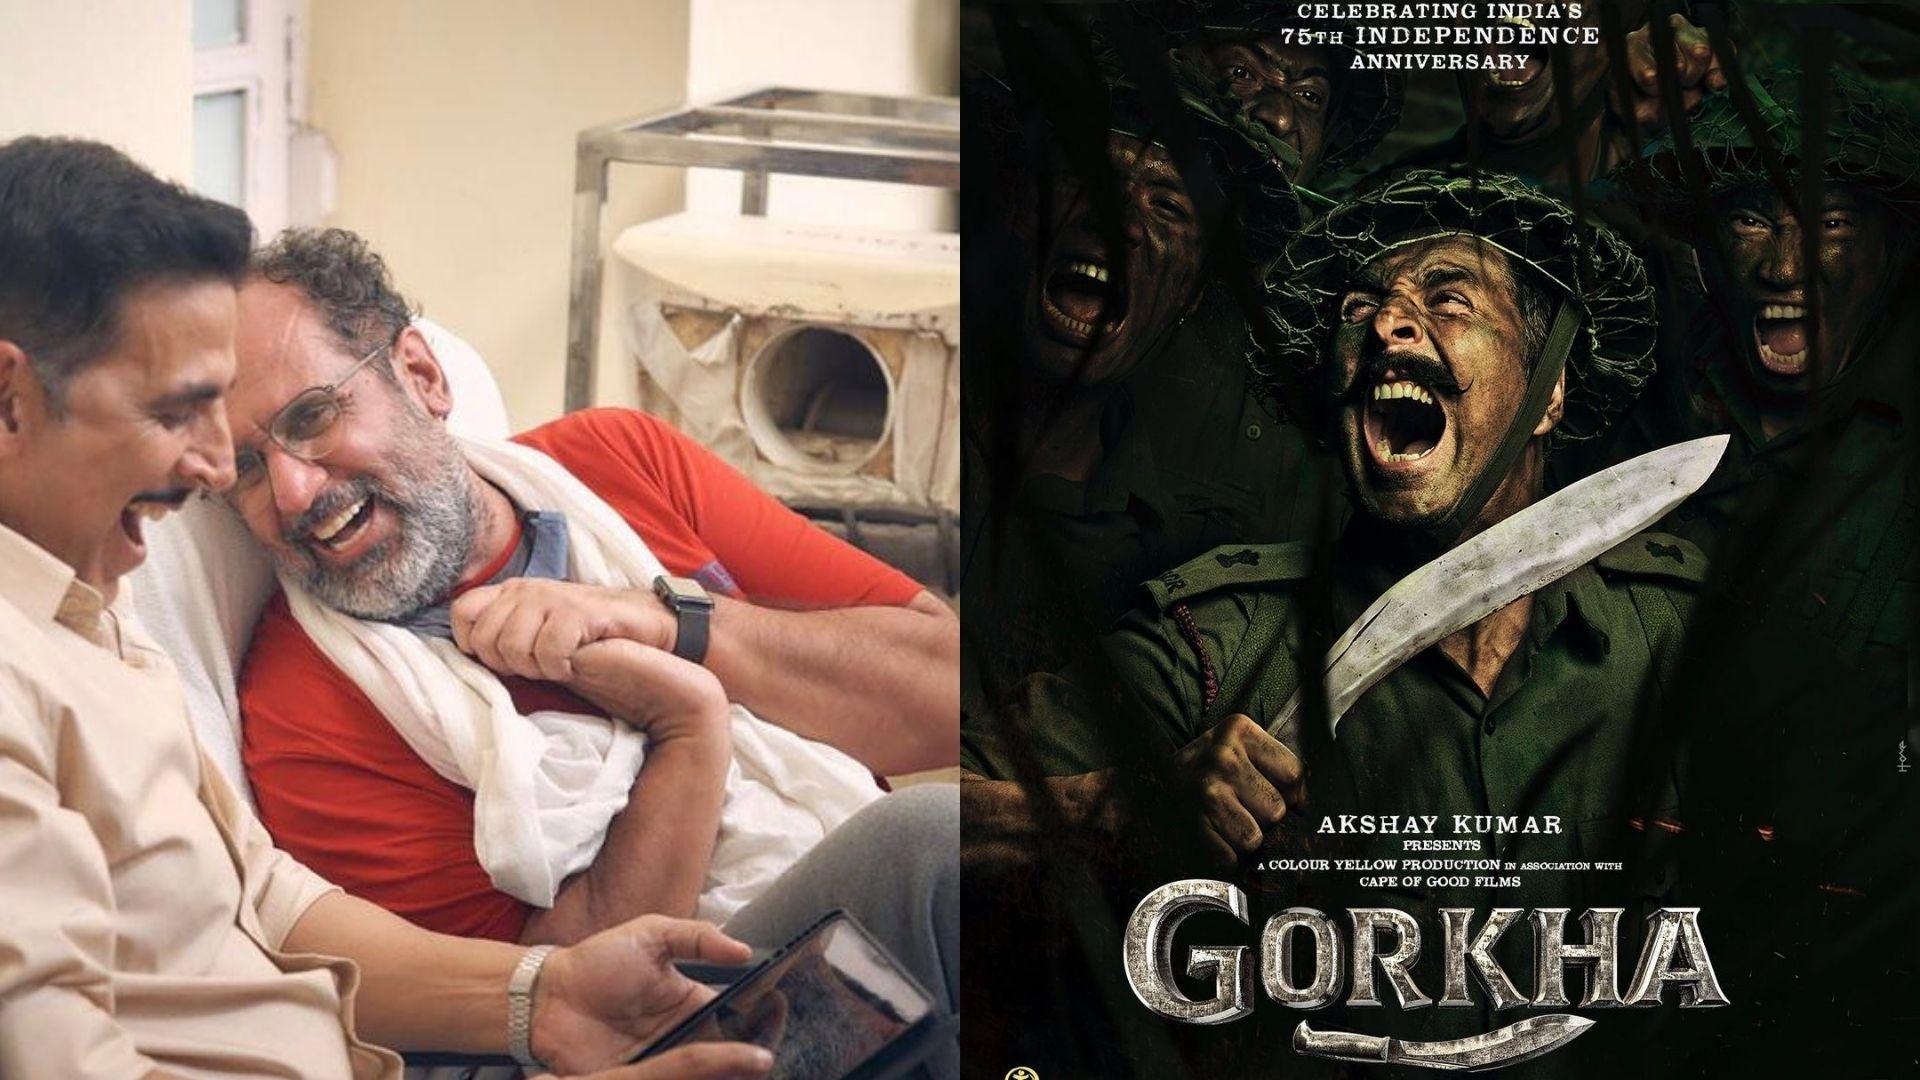 Gorkha Announcement: Akshay Kumar To Play Major General Ian Cardozo In Aanand L Rai's Upcoming War Film